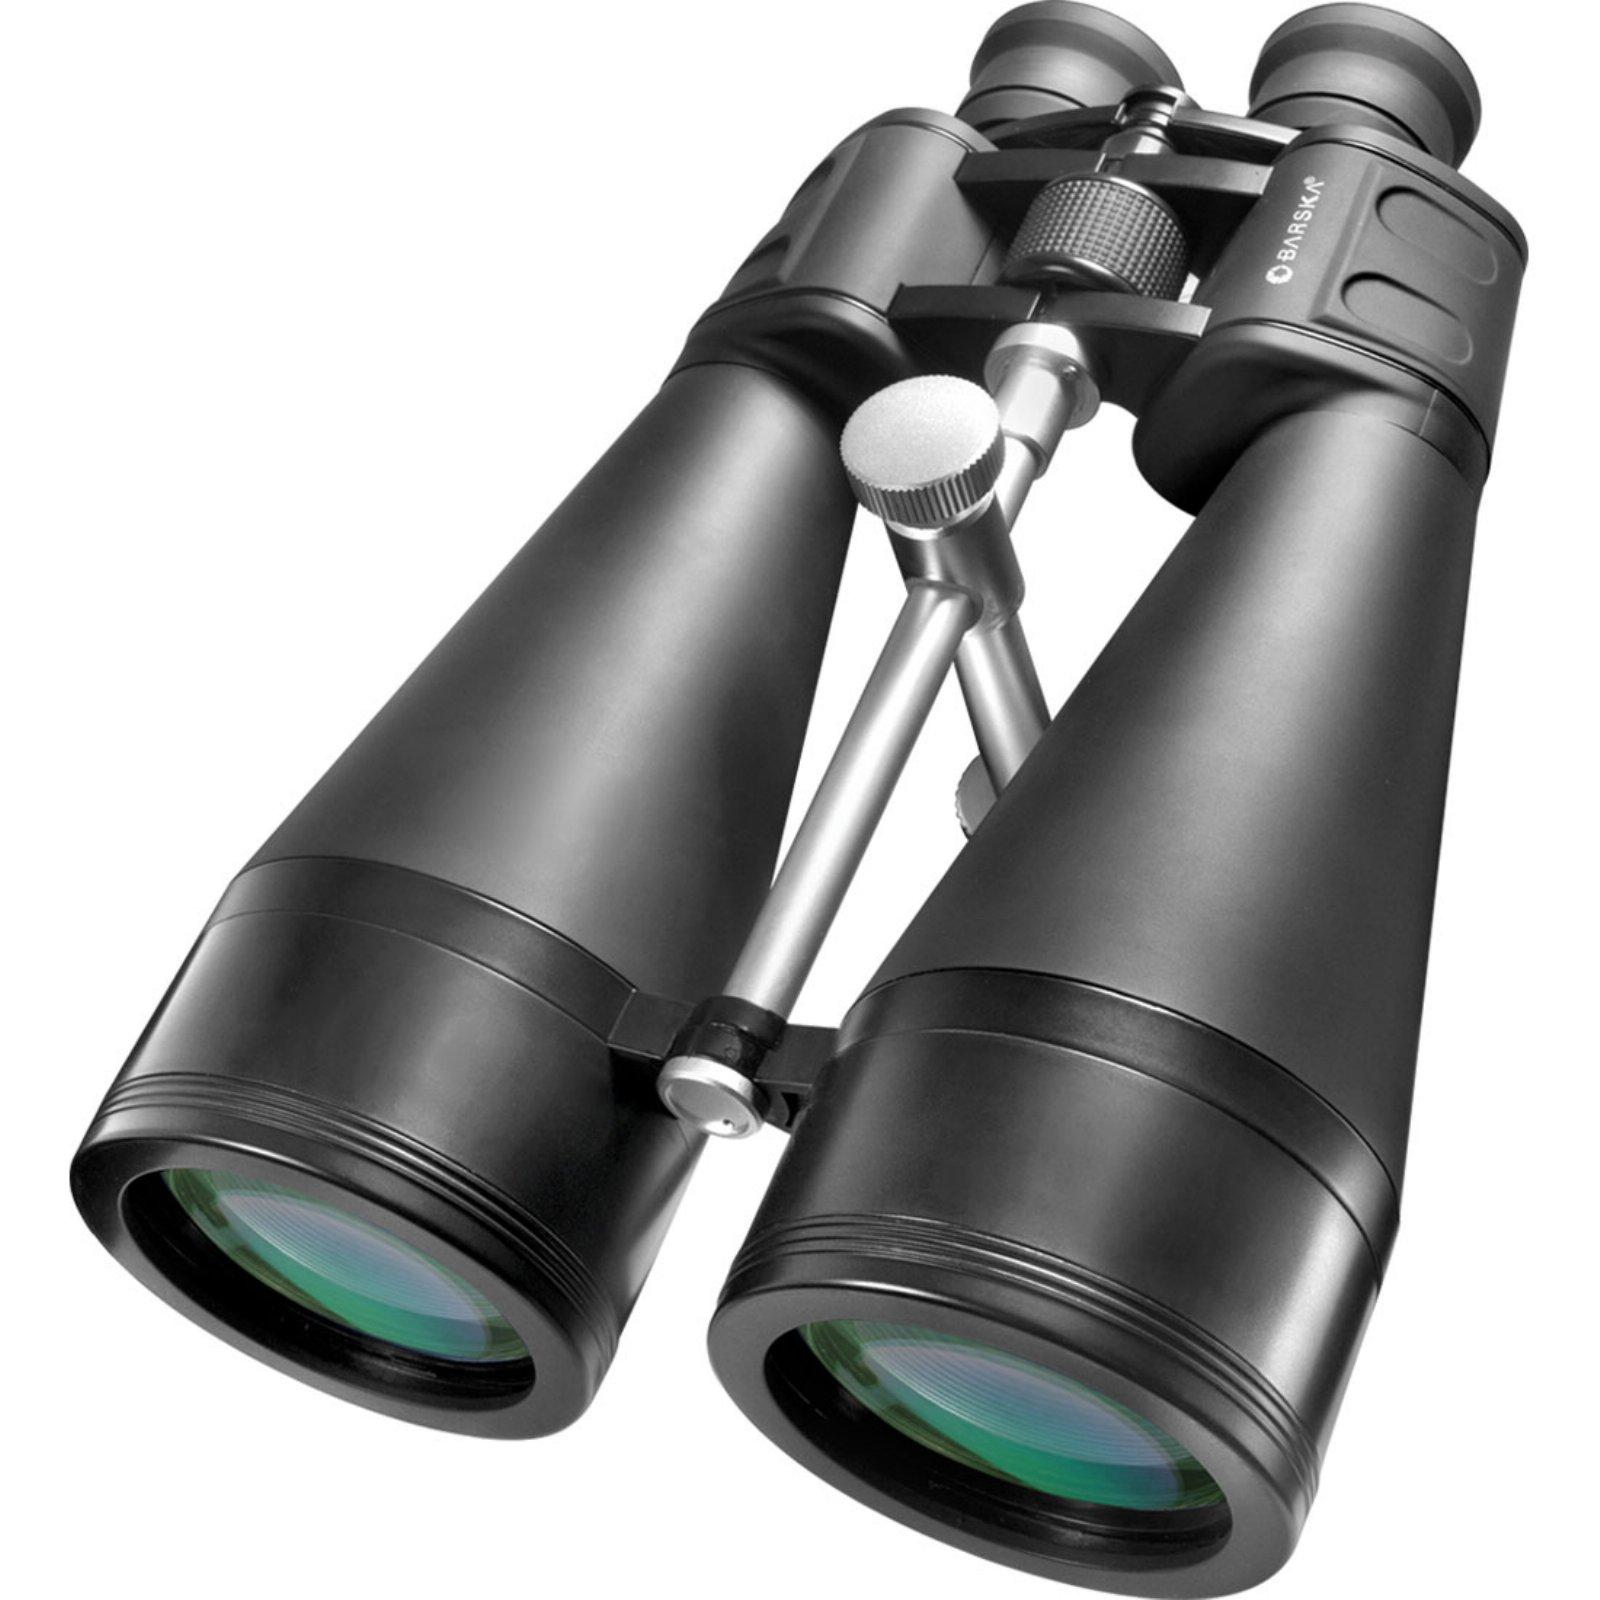 Barska 30x80mm X-Trail Binoculars by Overstock